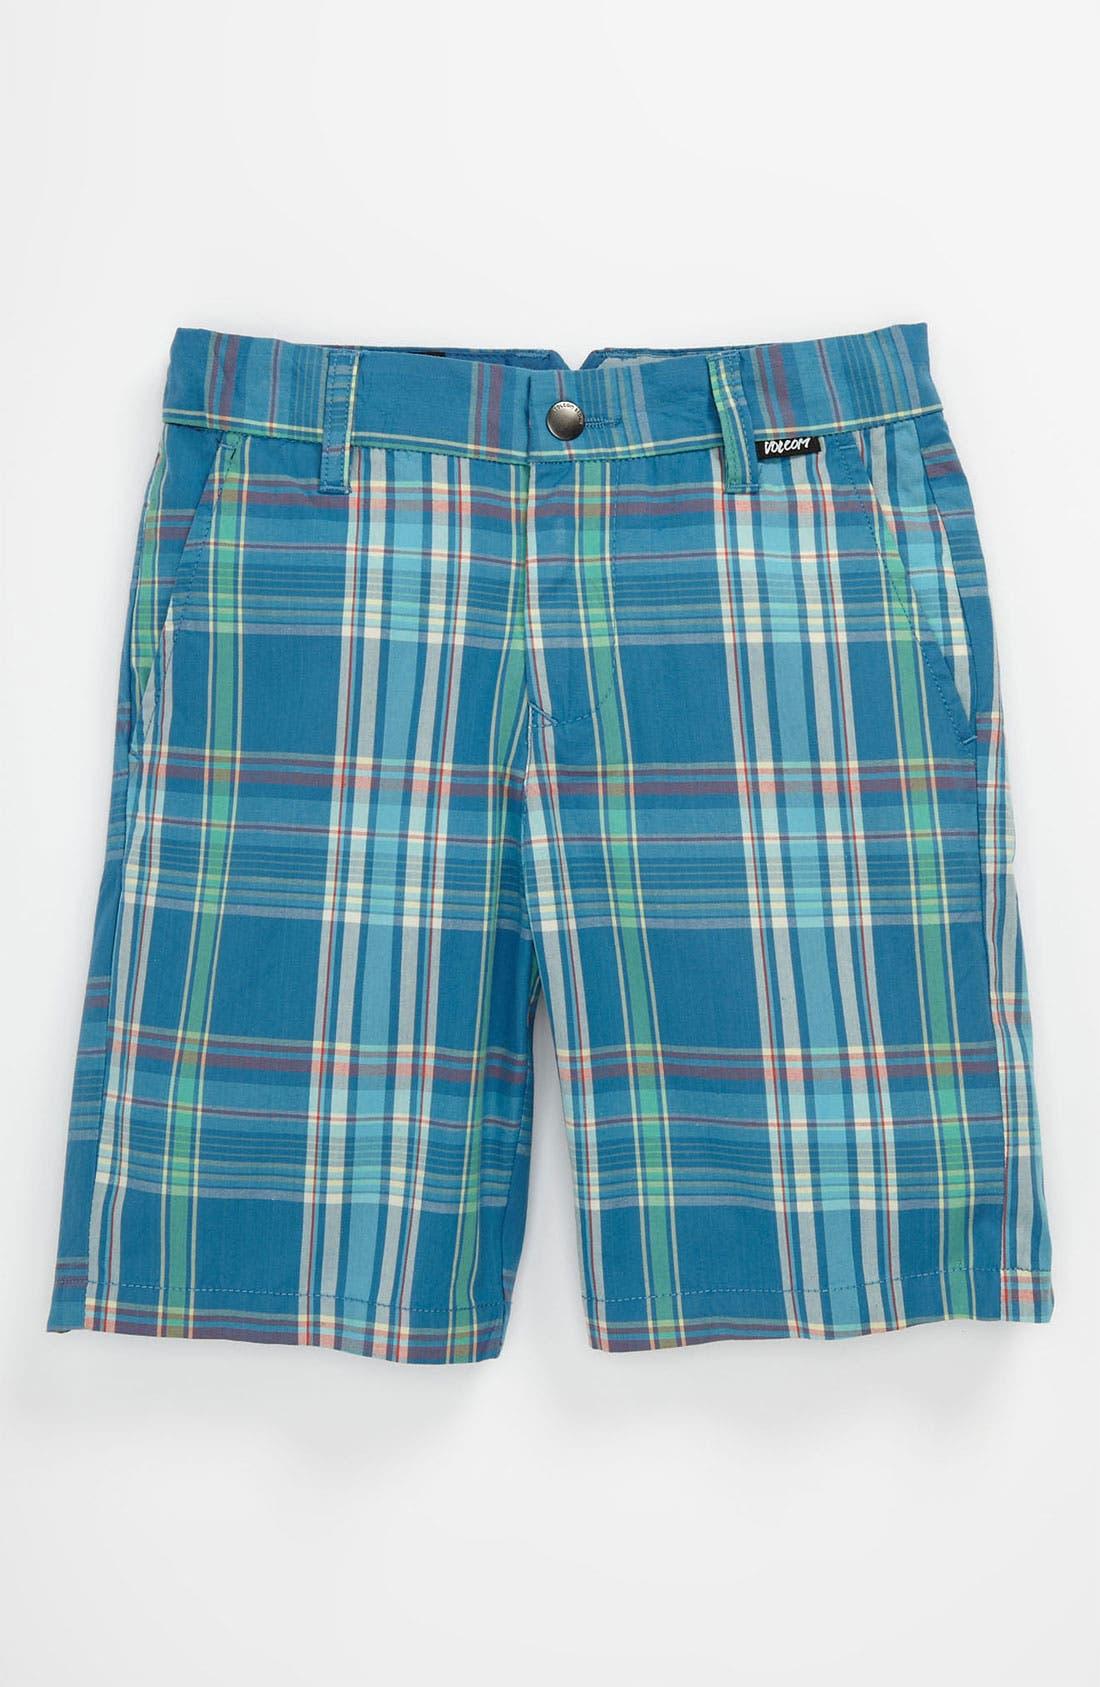 Alternate Image 1 Selected - Volcom 'Rushy' Plaid Shorts (Little Boys)